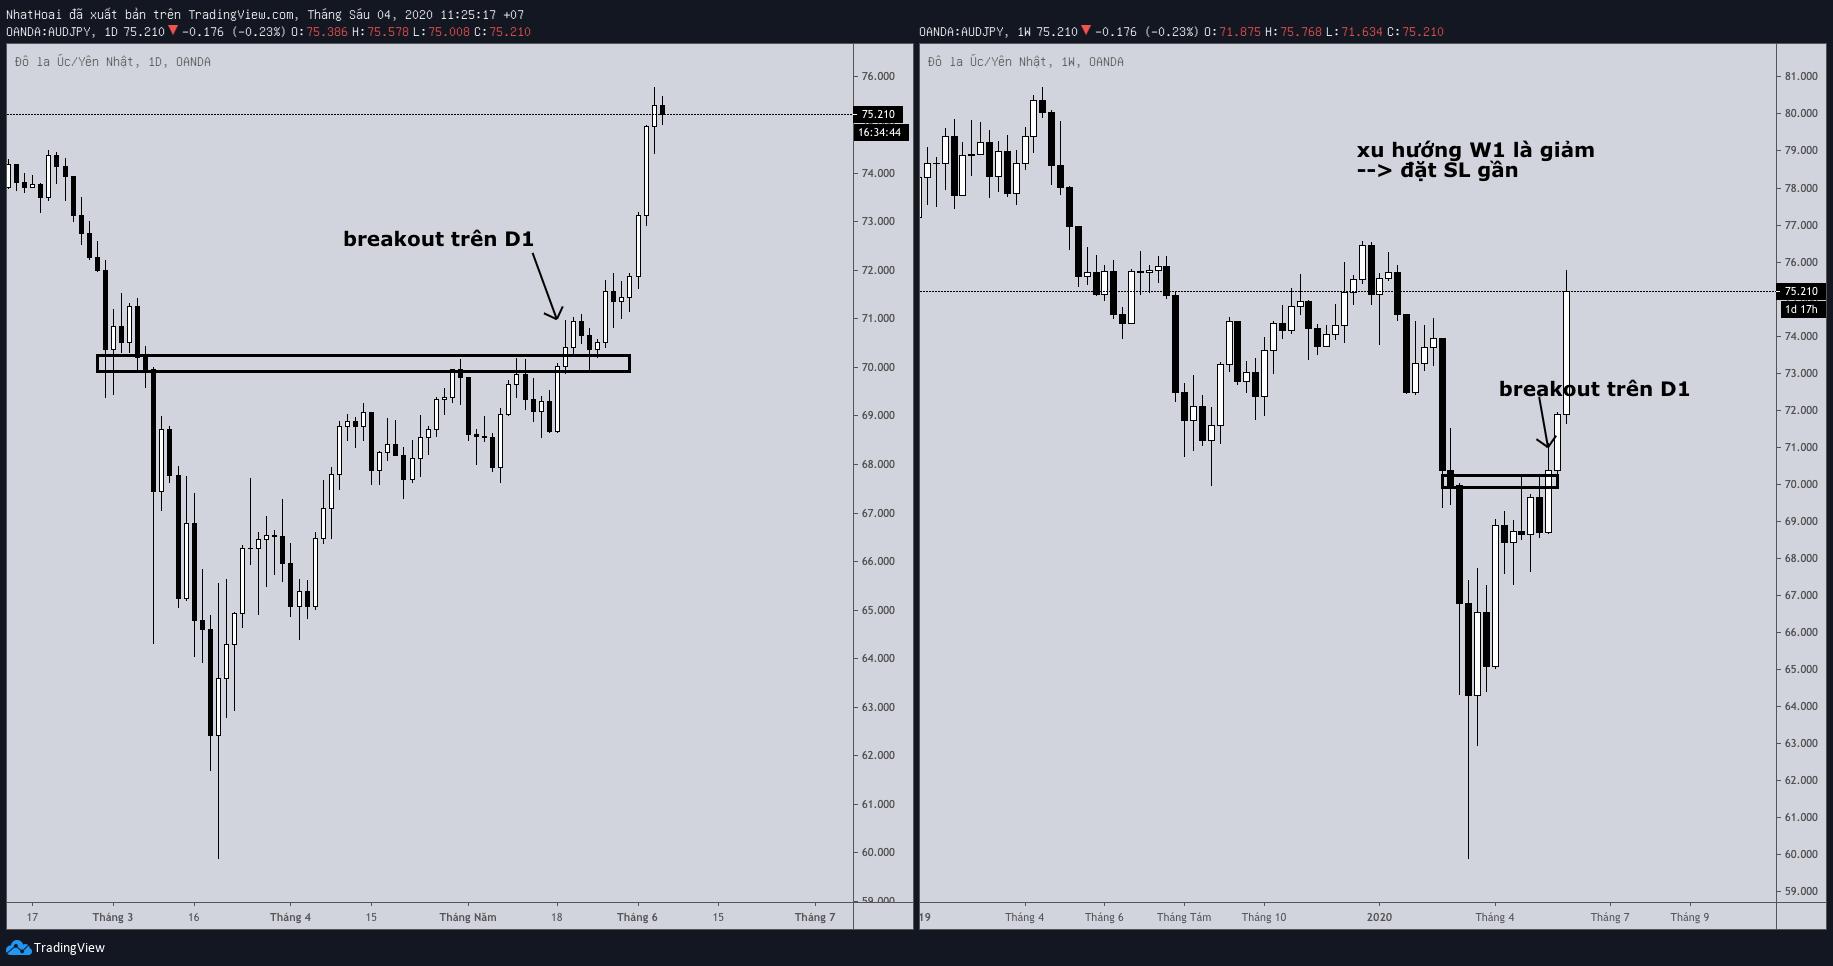 stop-loss-breakout-traderviet1.